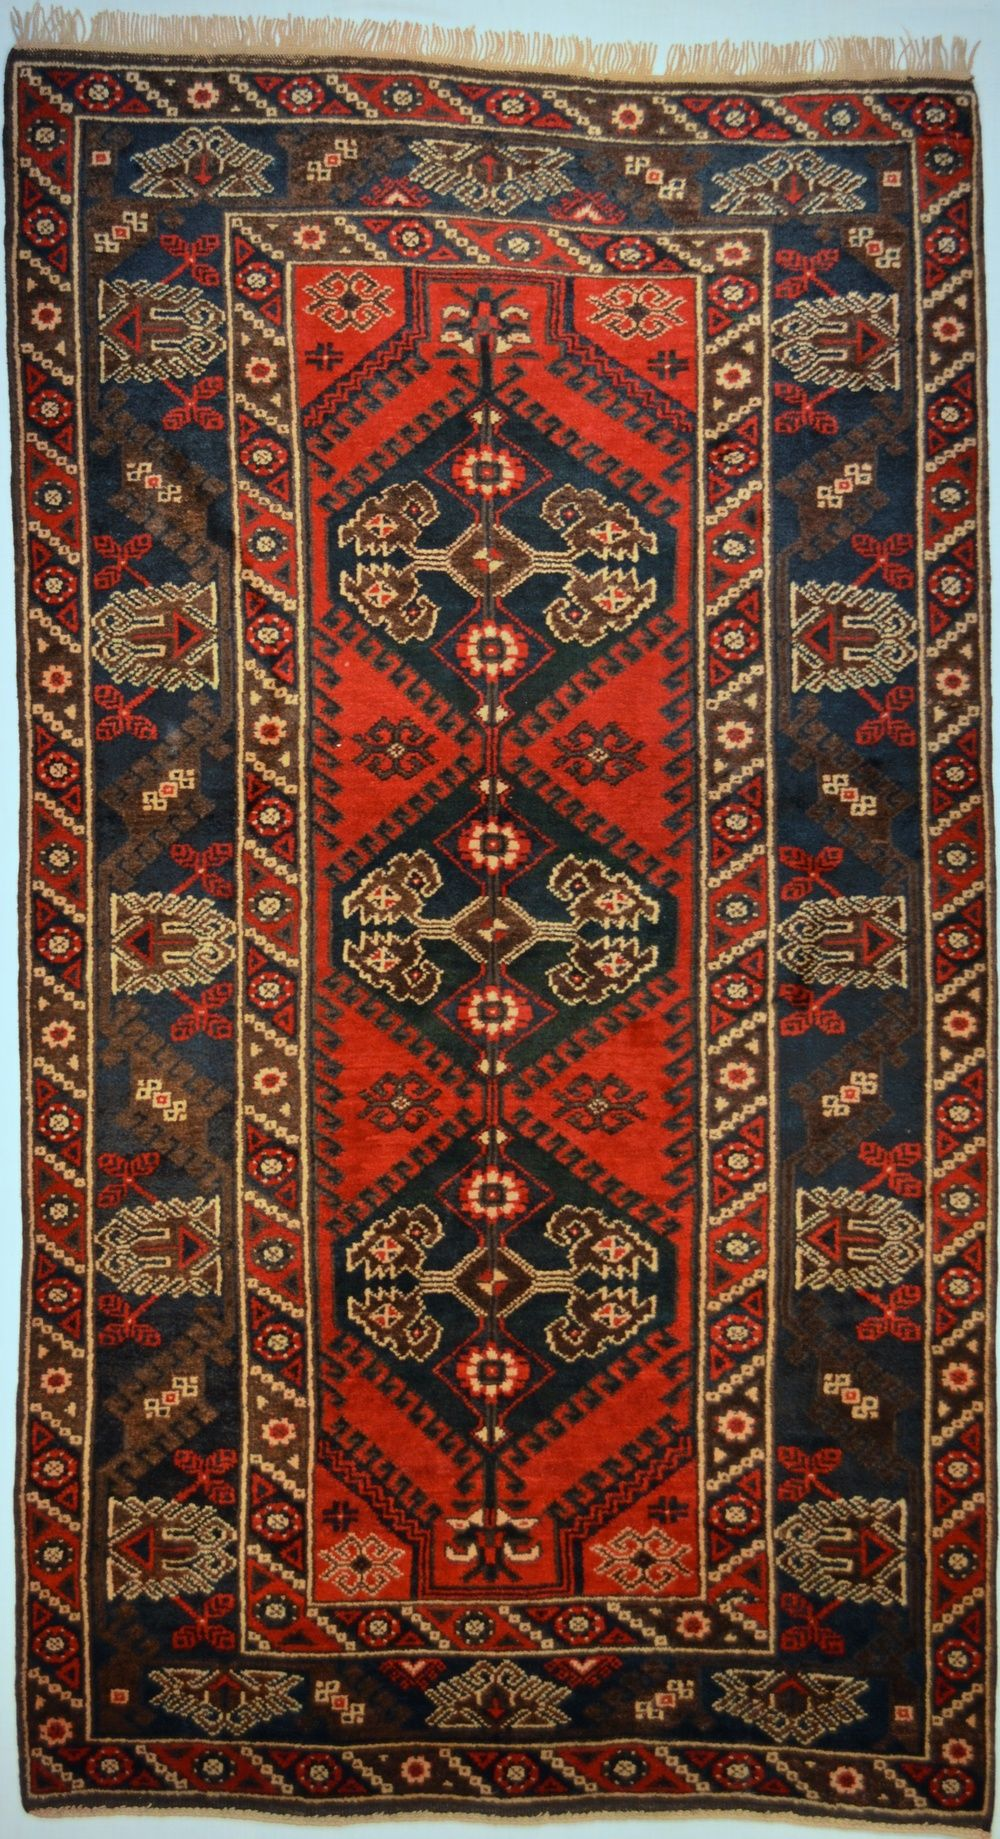 Dusemealti Rug Rugs On Carpet Rugs Patterned Carpet